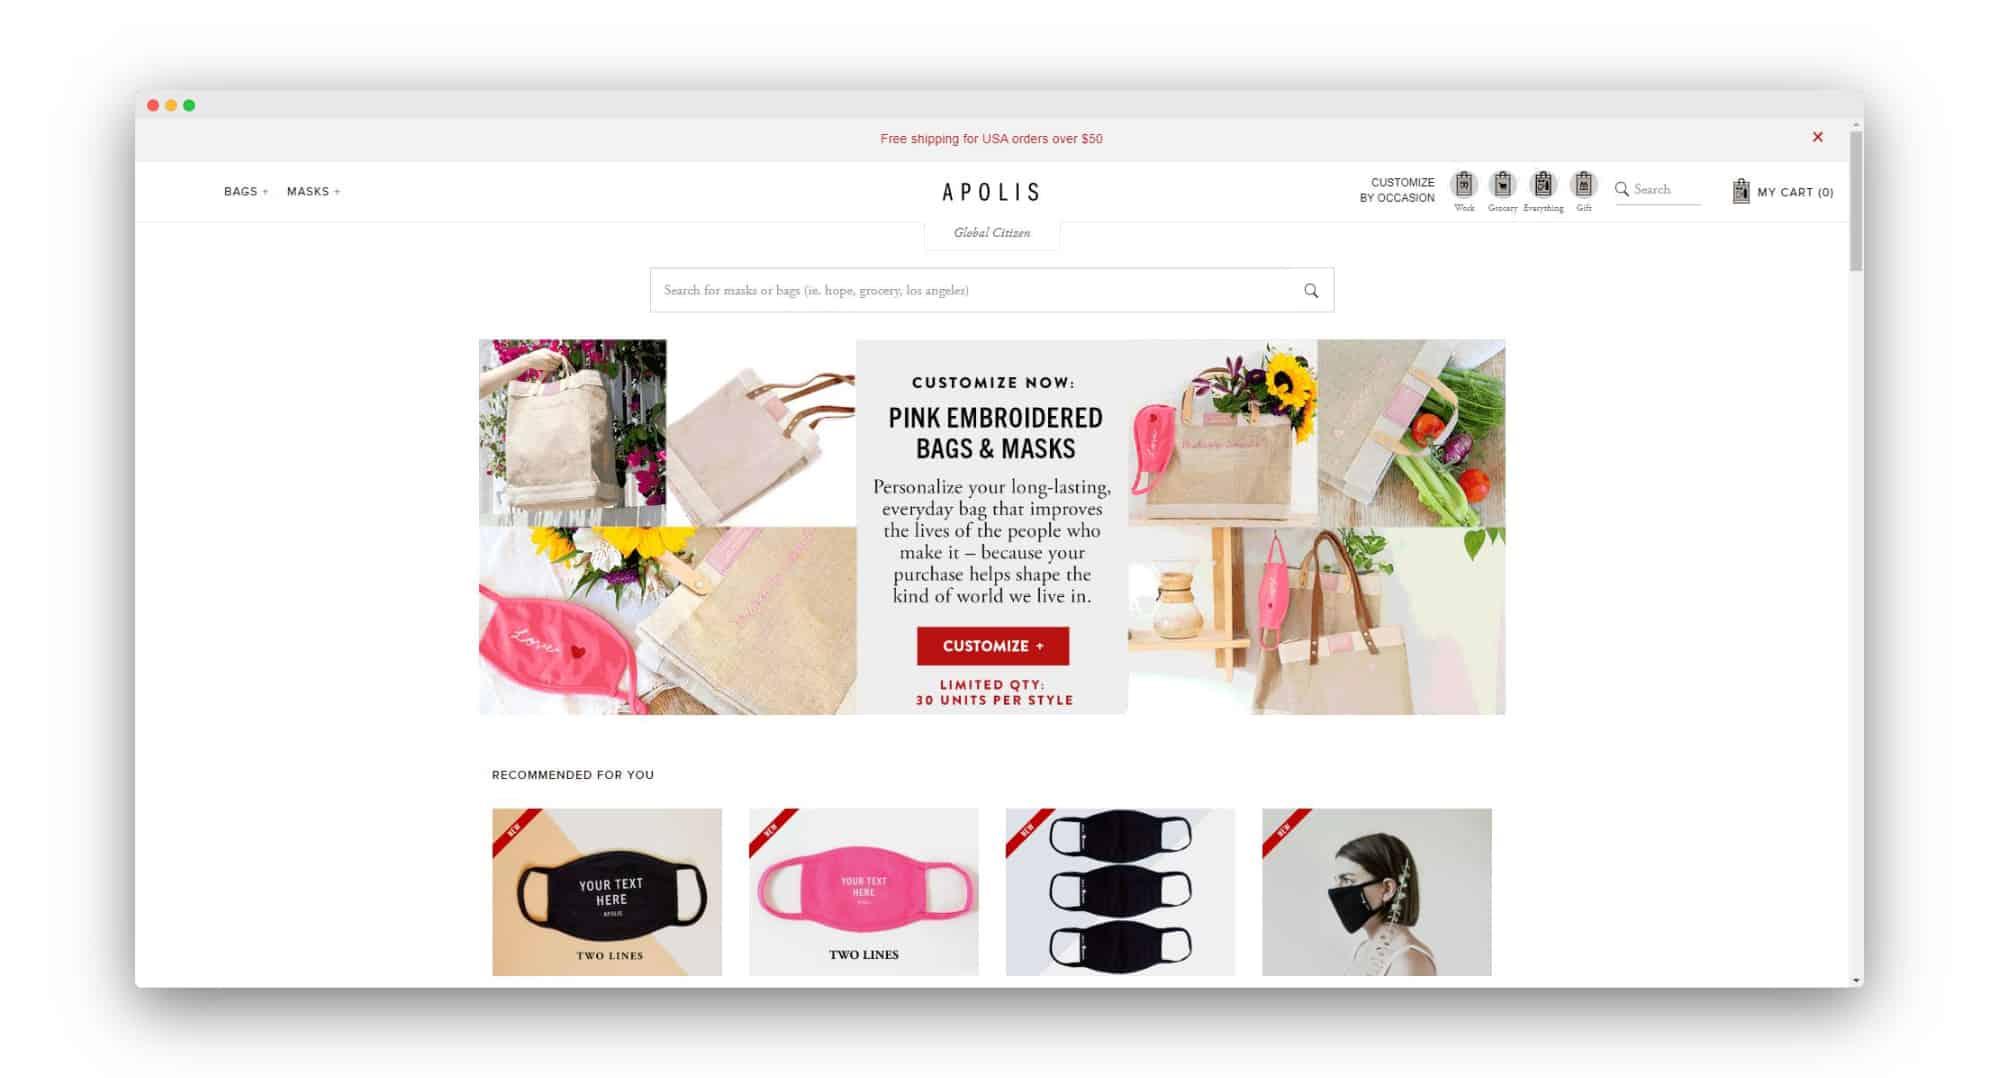 Apolis Direct to Consumer Brand